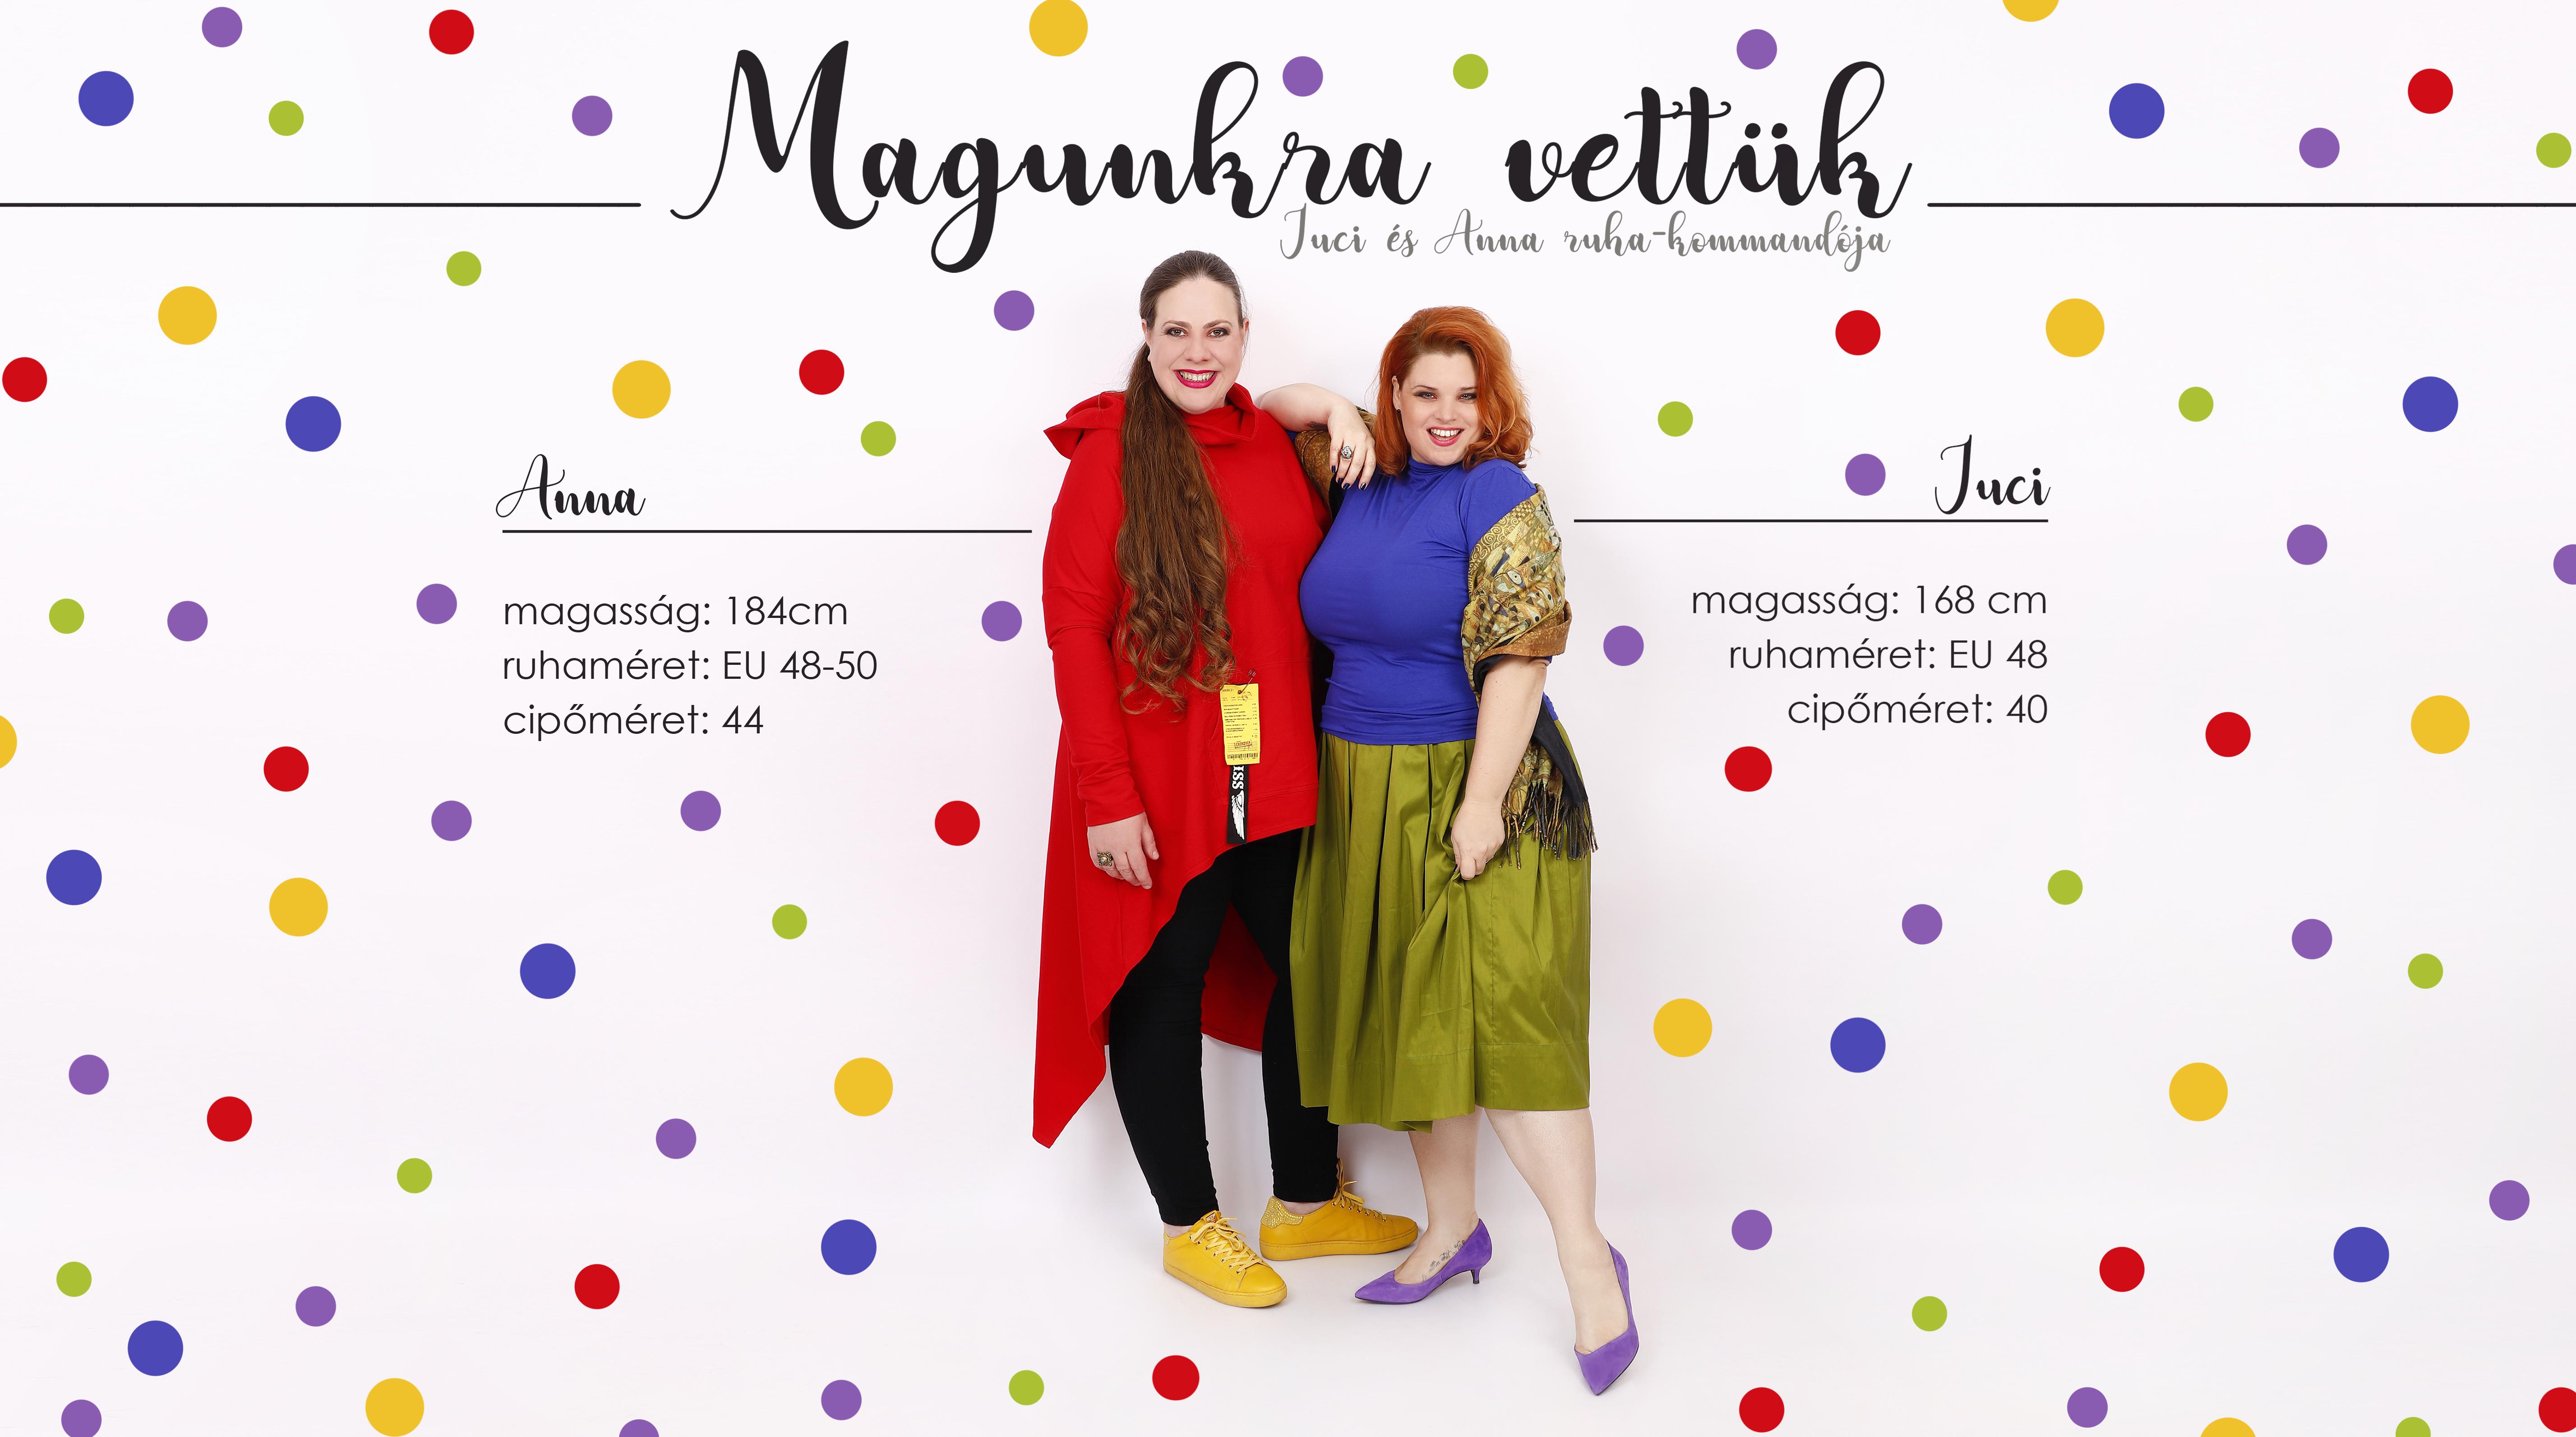 magunkra_vettuk_8_resz_cov.jpg